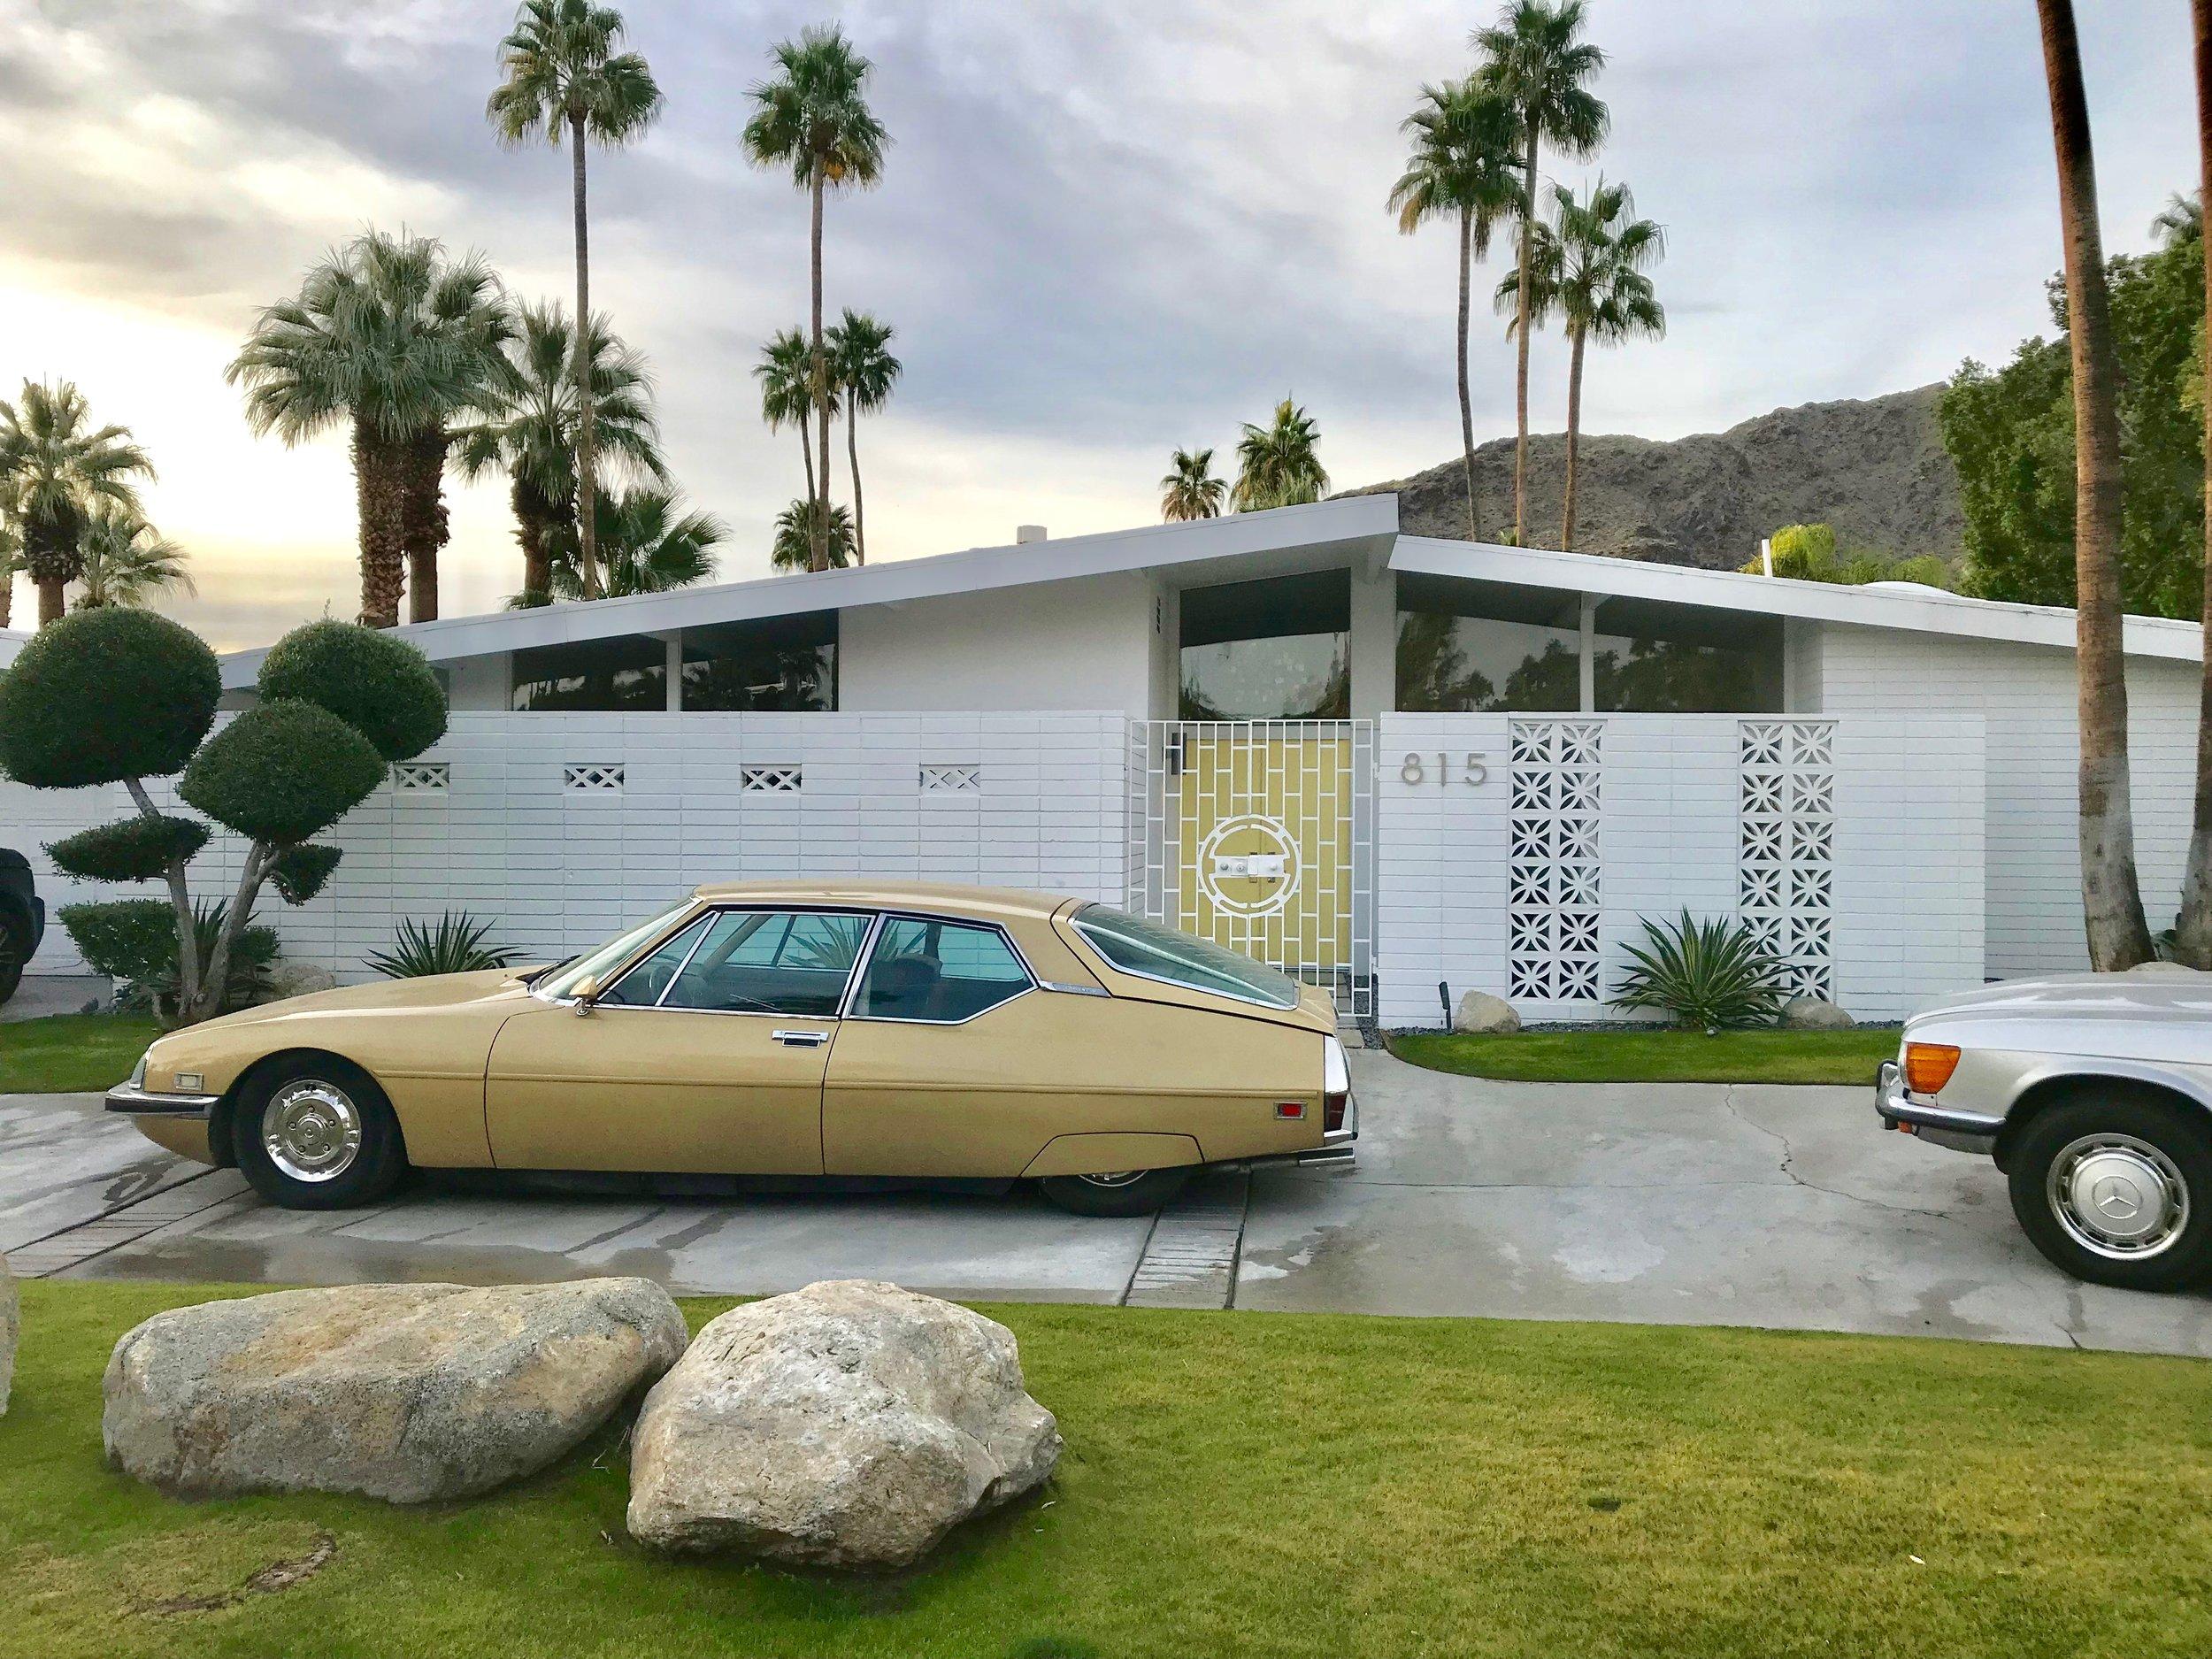 yellow door. architectural tour of Palm Springs. Blue Moon furniture store winnipeg.jpg